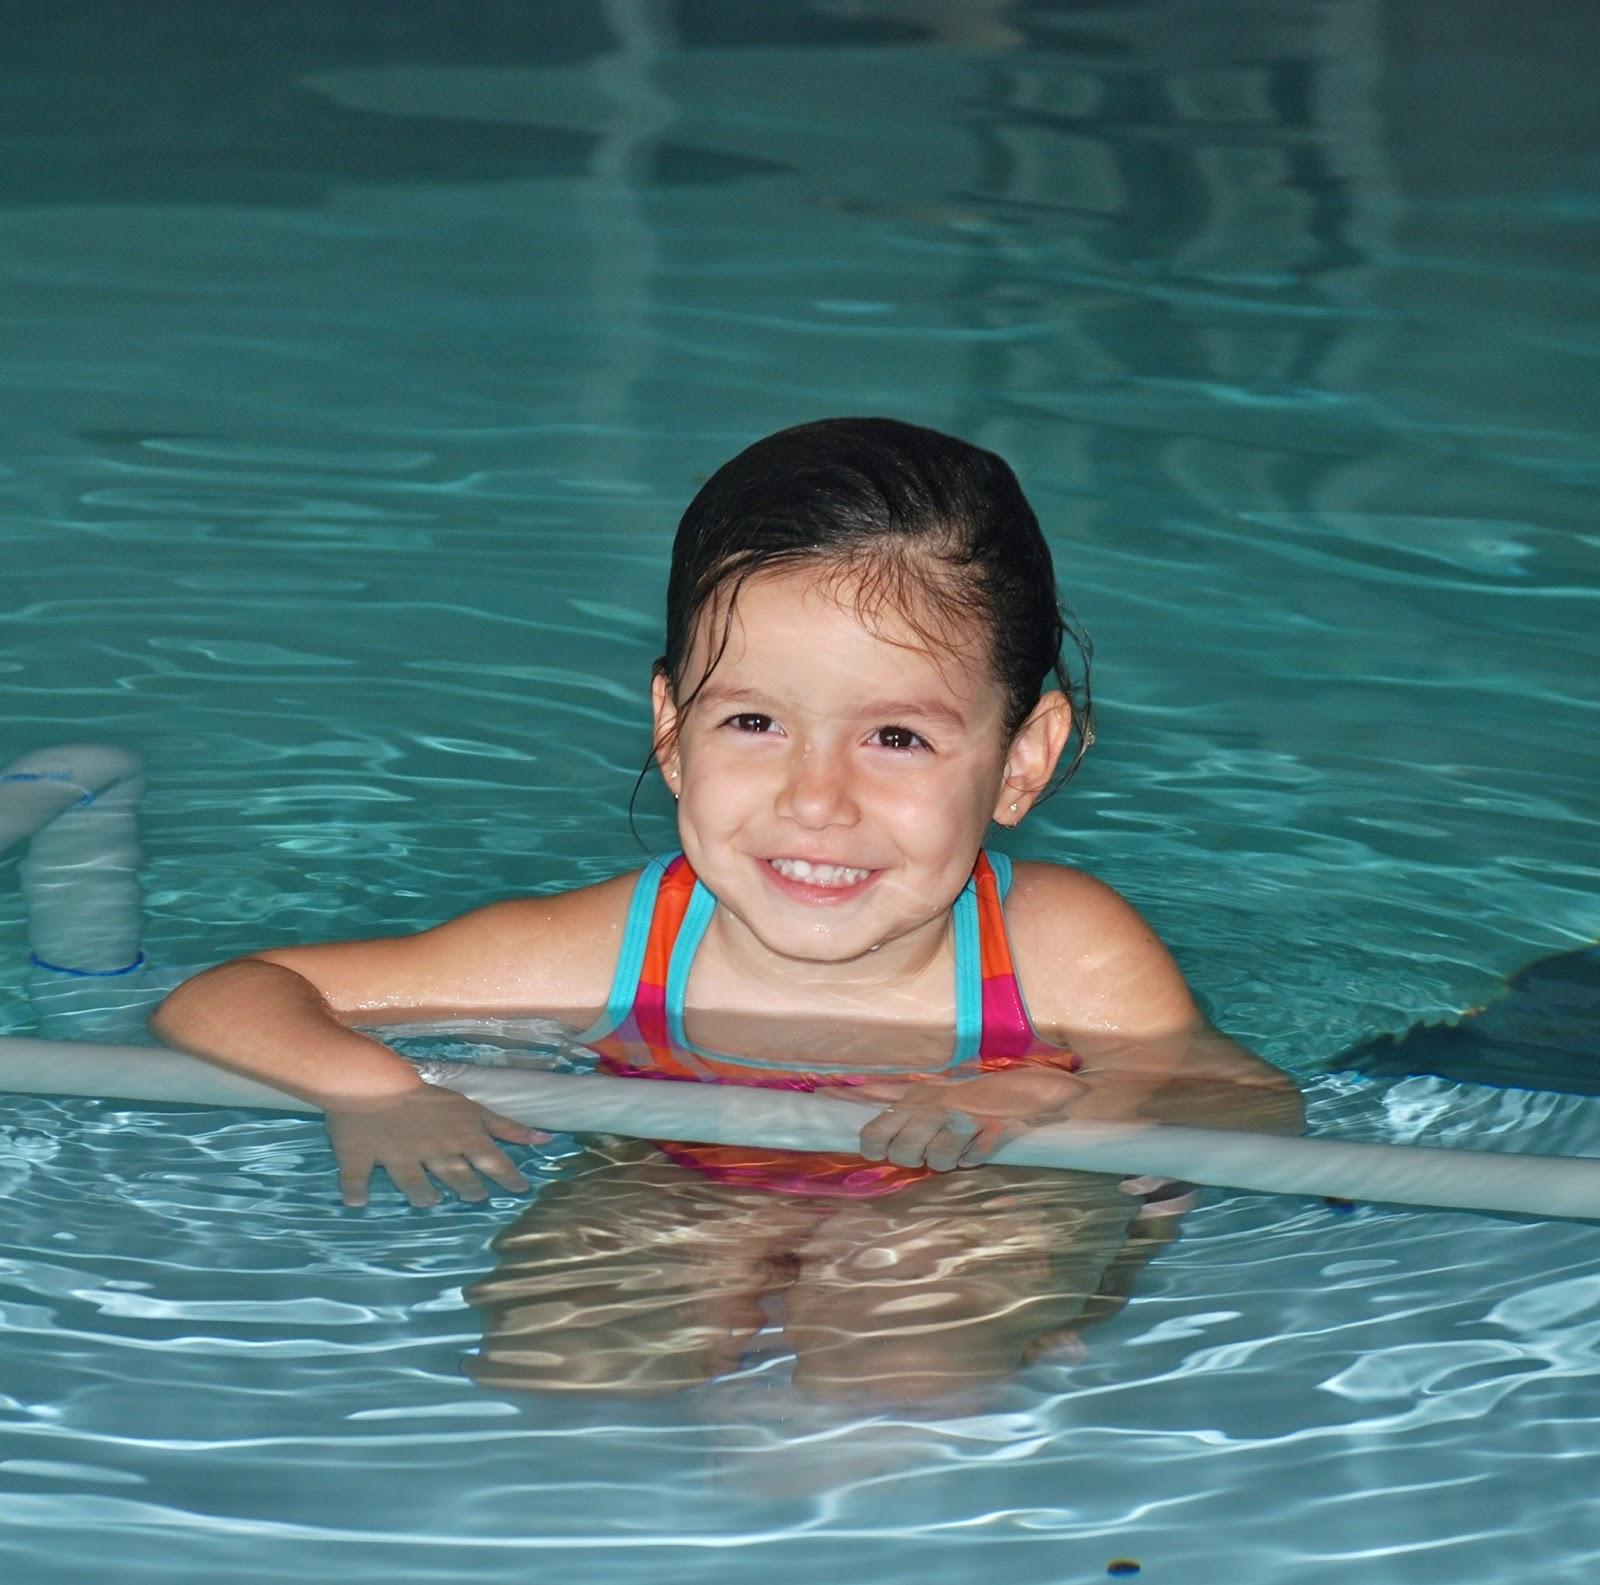 Deep blue swim school swimming lessons for kids near los - Swimming lessons indoor pool near me ...